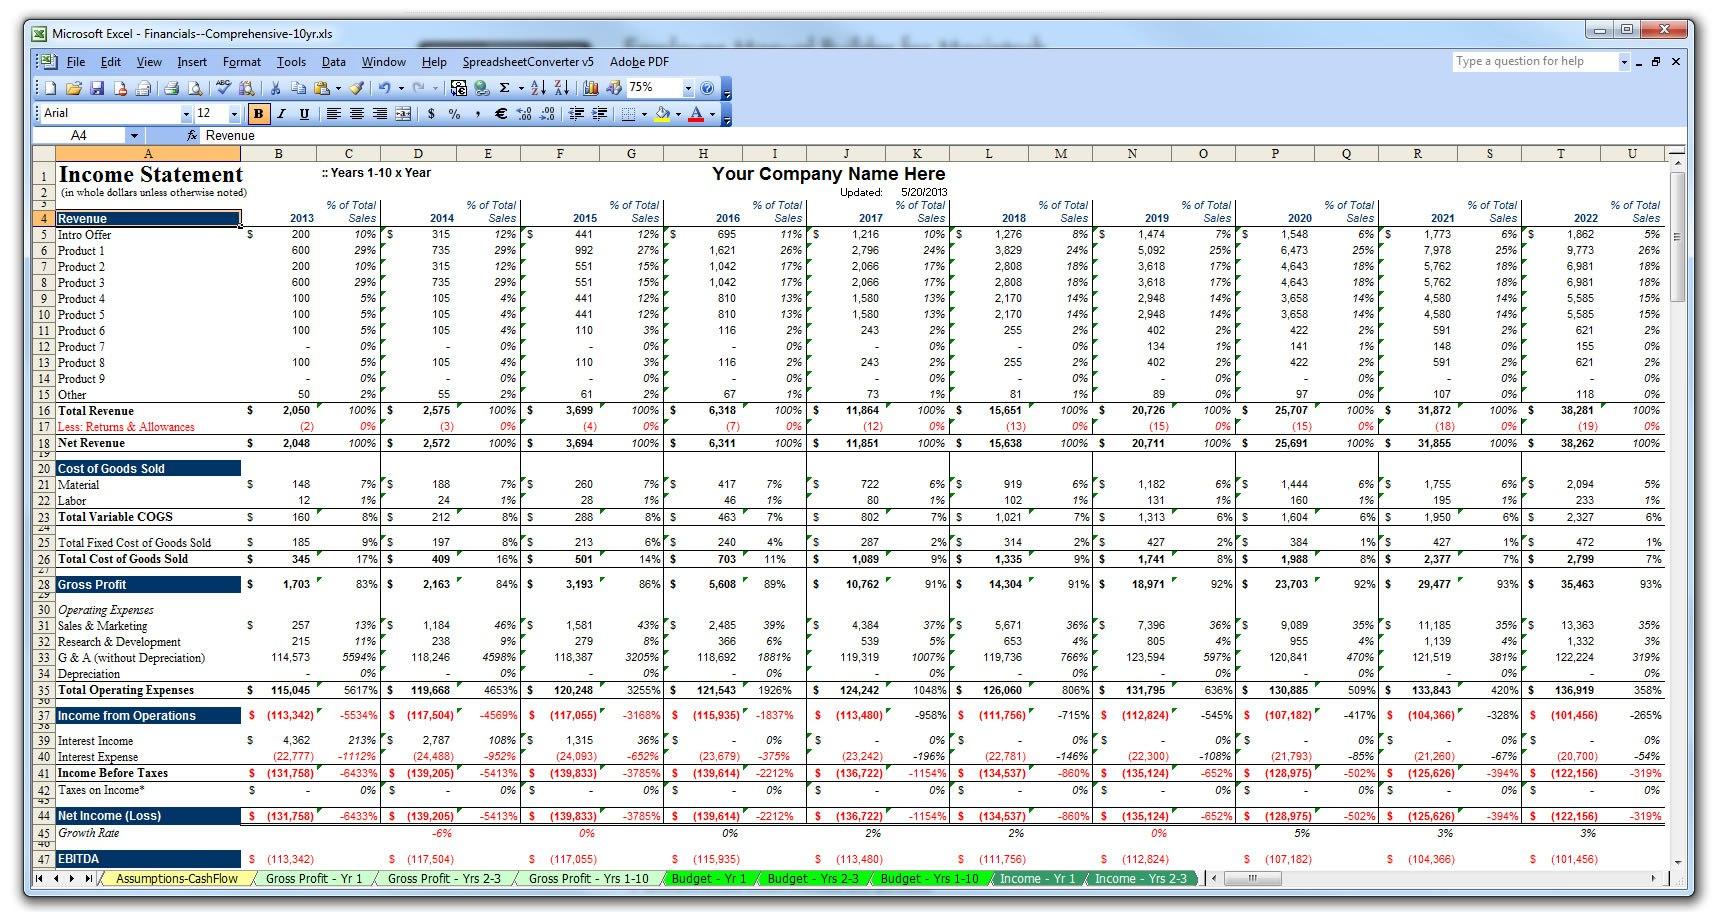 Financial Planning Retirement Spreadsheet Regarding Financial Planner Excel Onwe Bioinnova On Retirement Planning